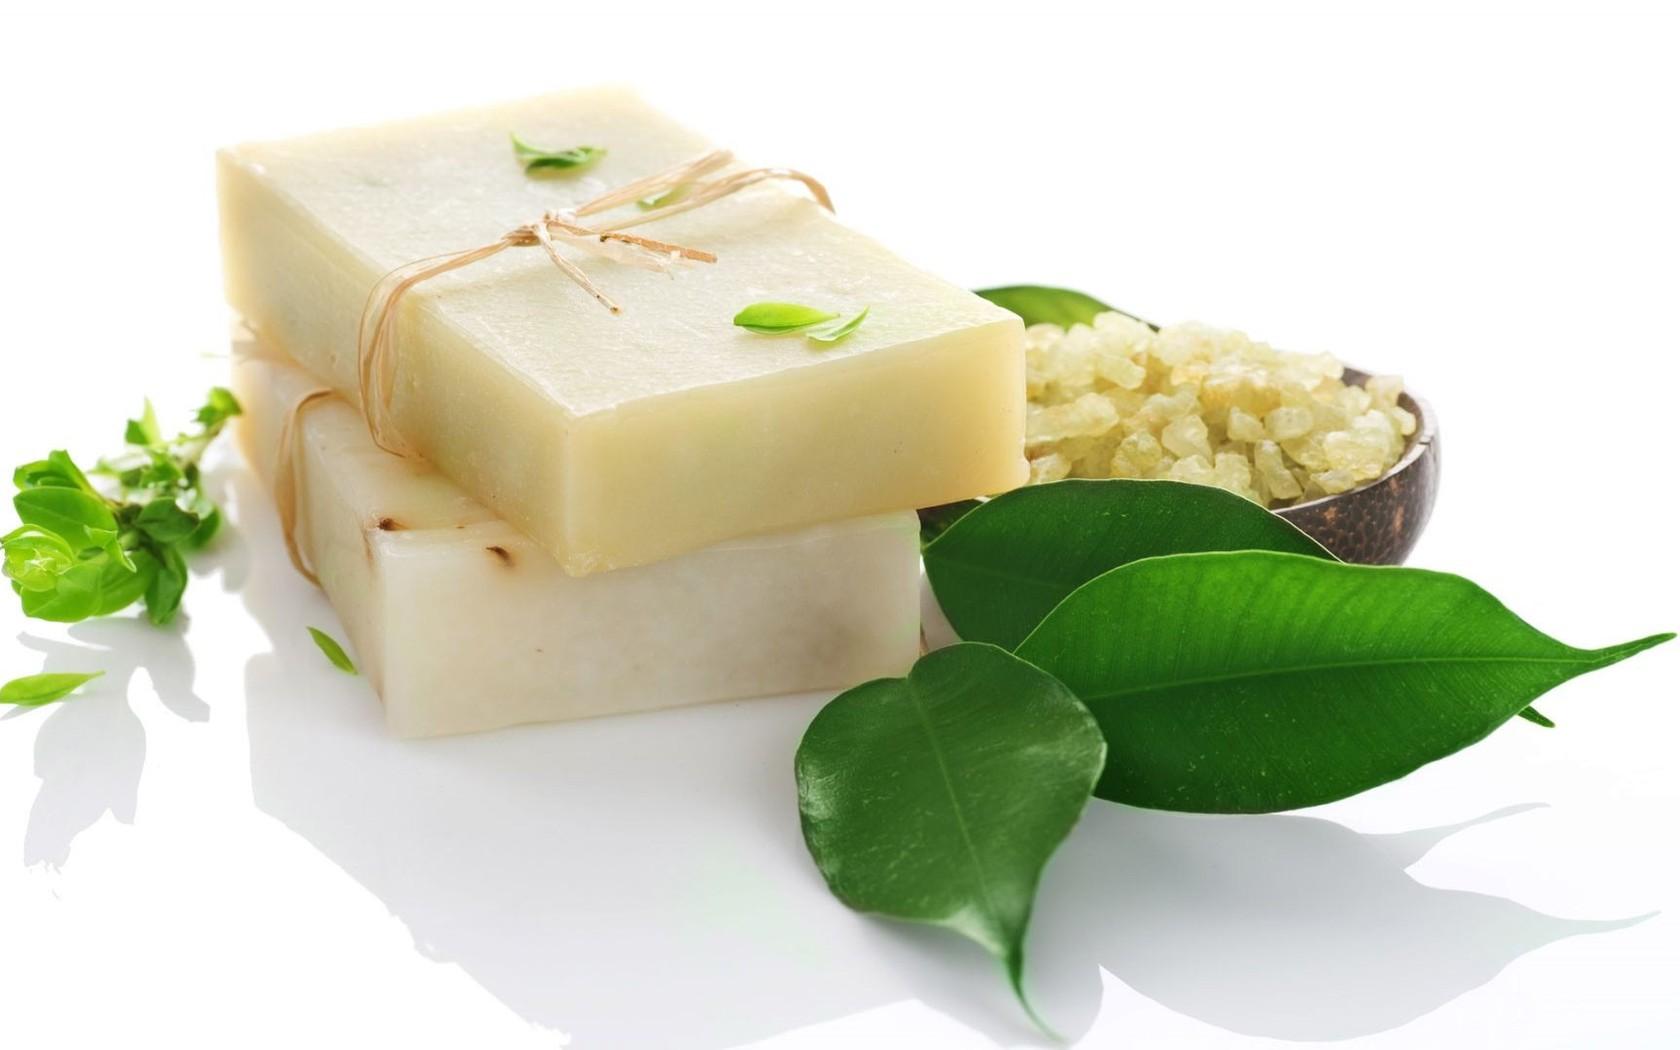 Spa soap wallpaper 8602 1680x1050